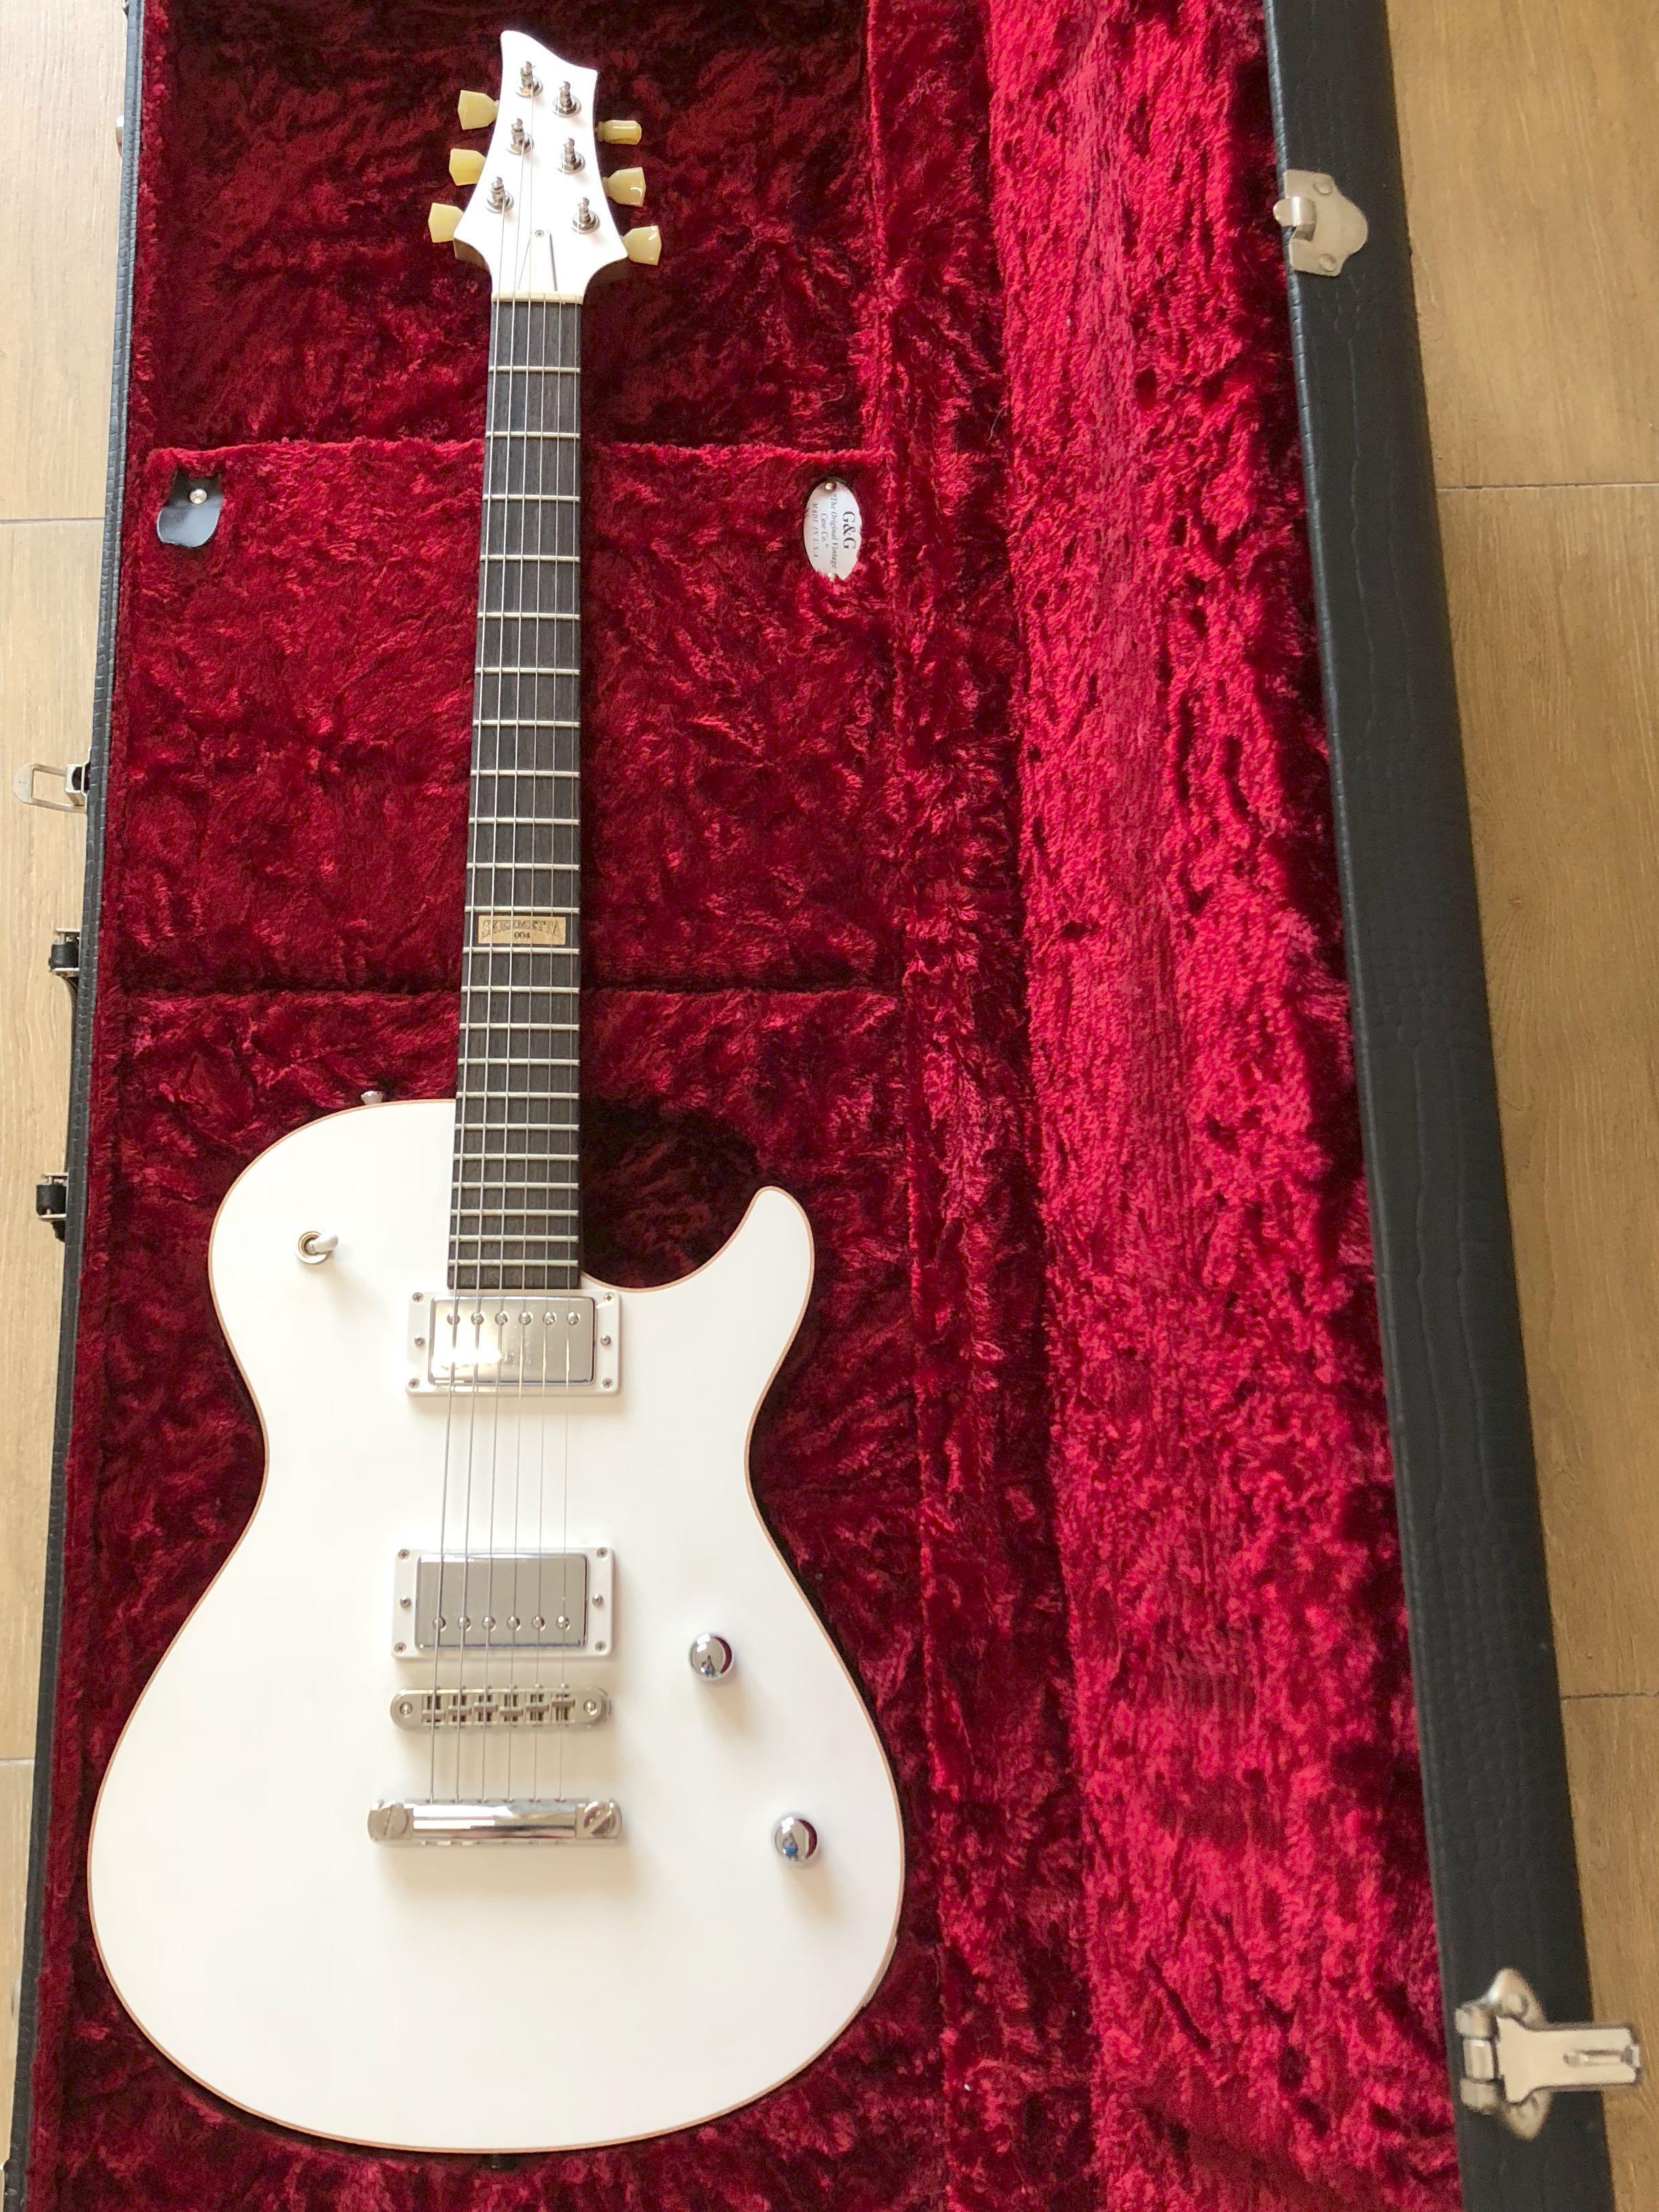 SKERMETTA Guitar For Trade Or Sale!, Music & Media, Music